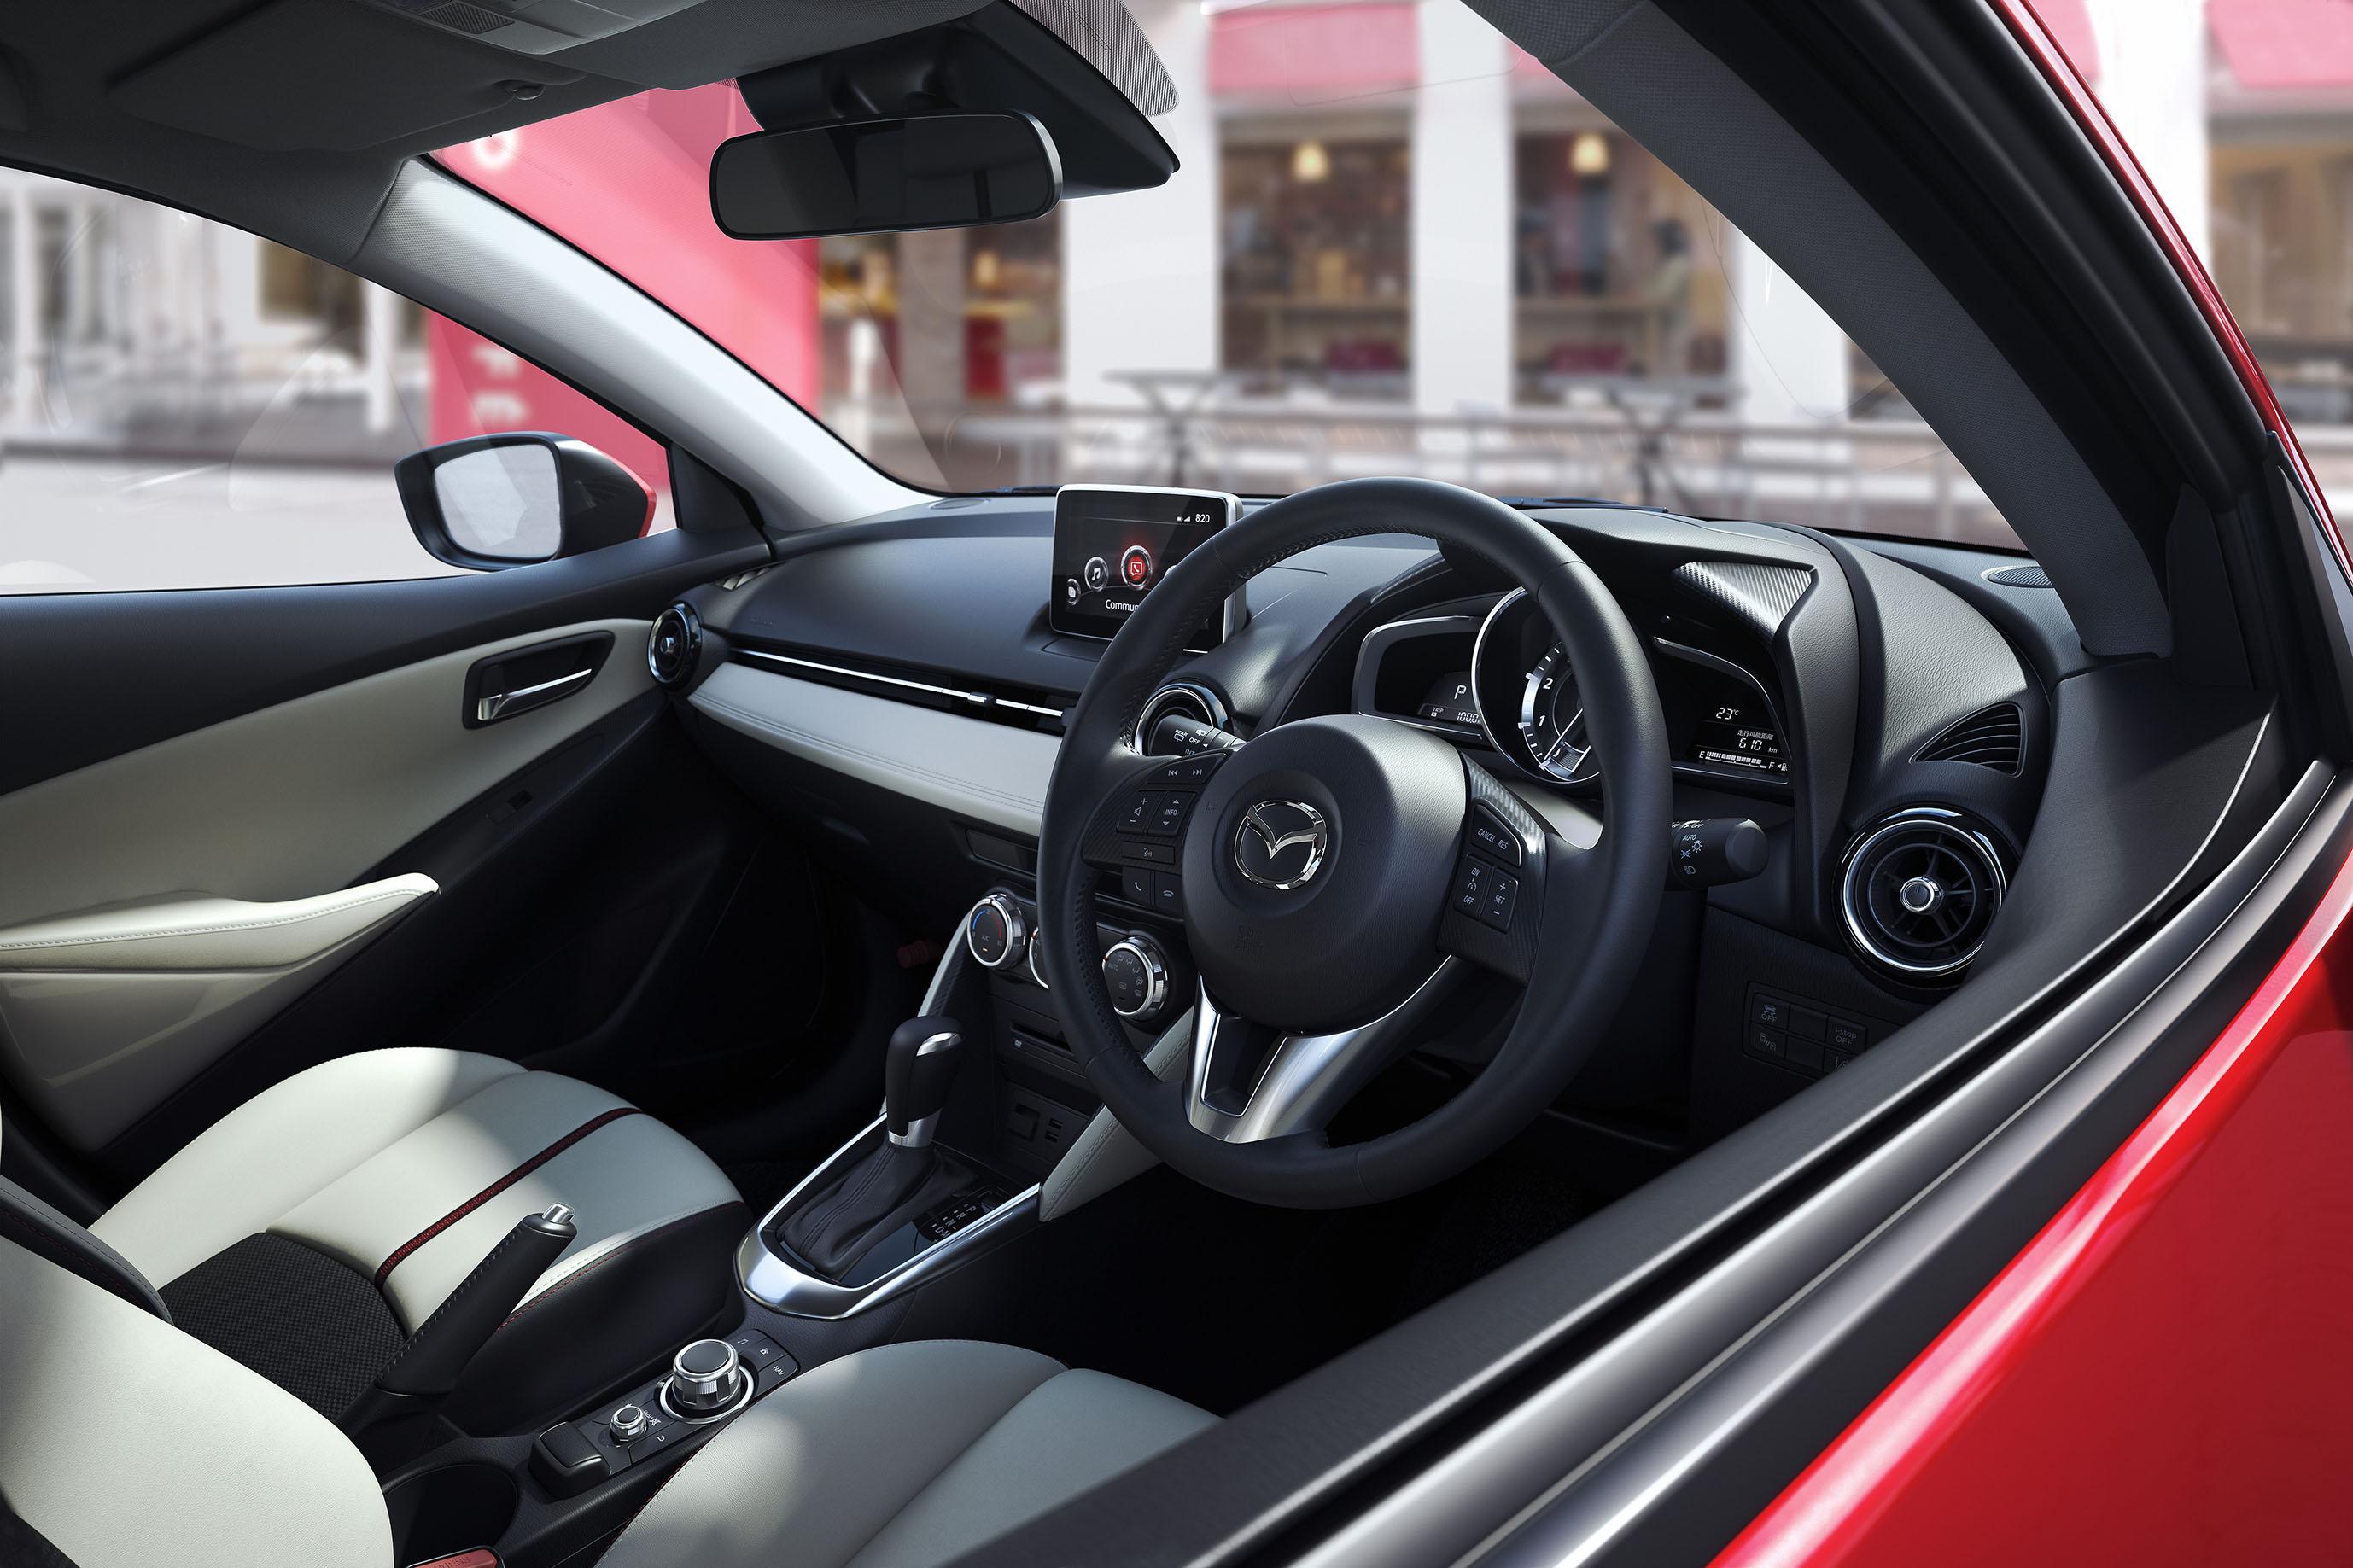 2016 Mazda 2 Cockpit and Dashboard